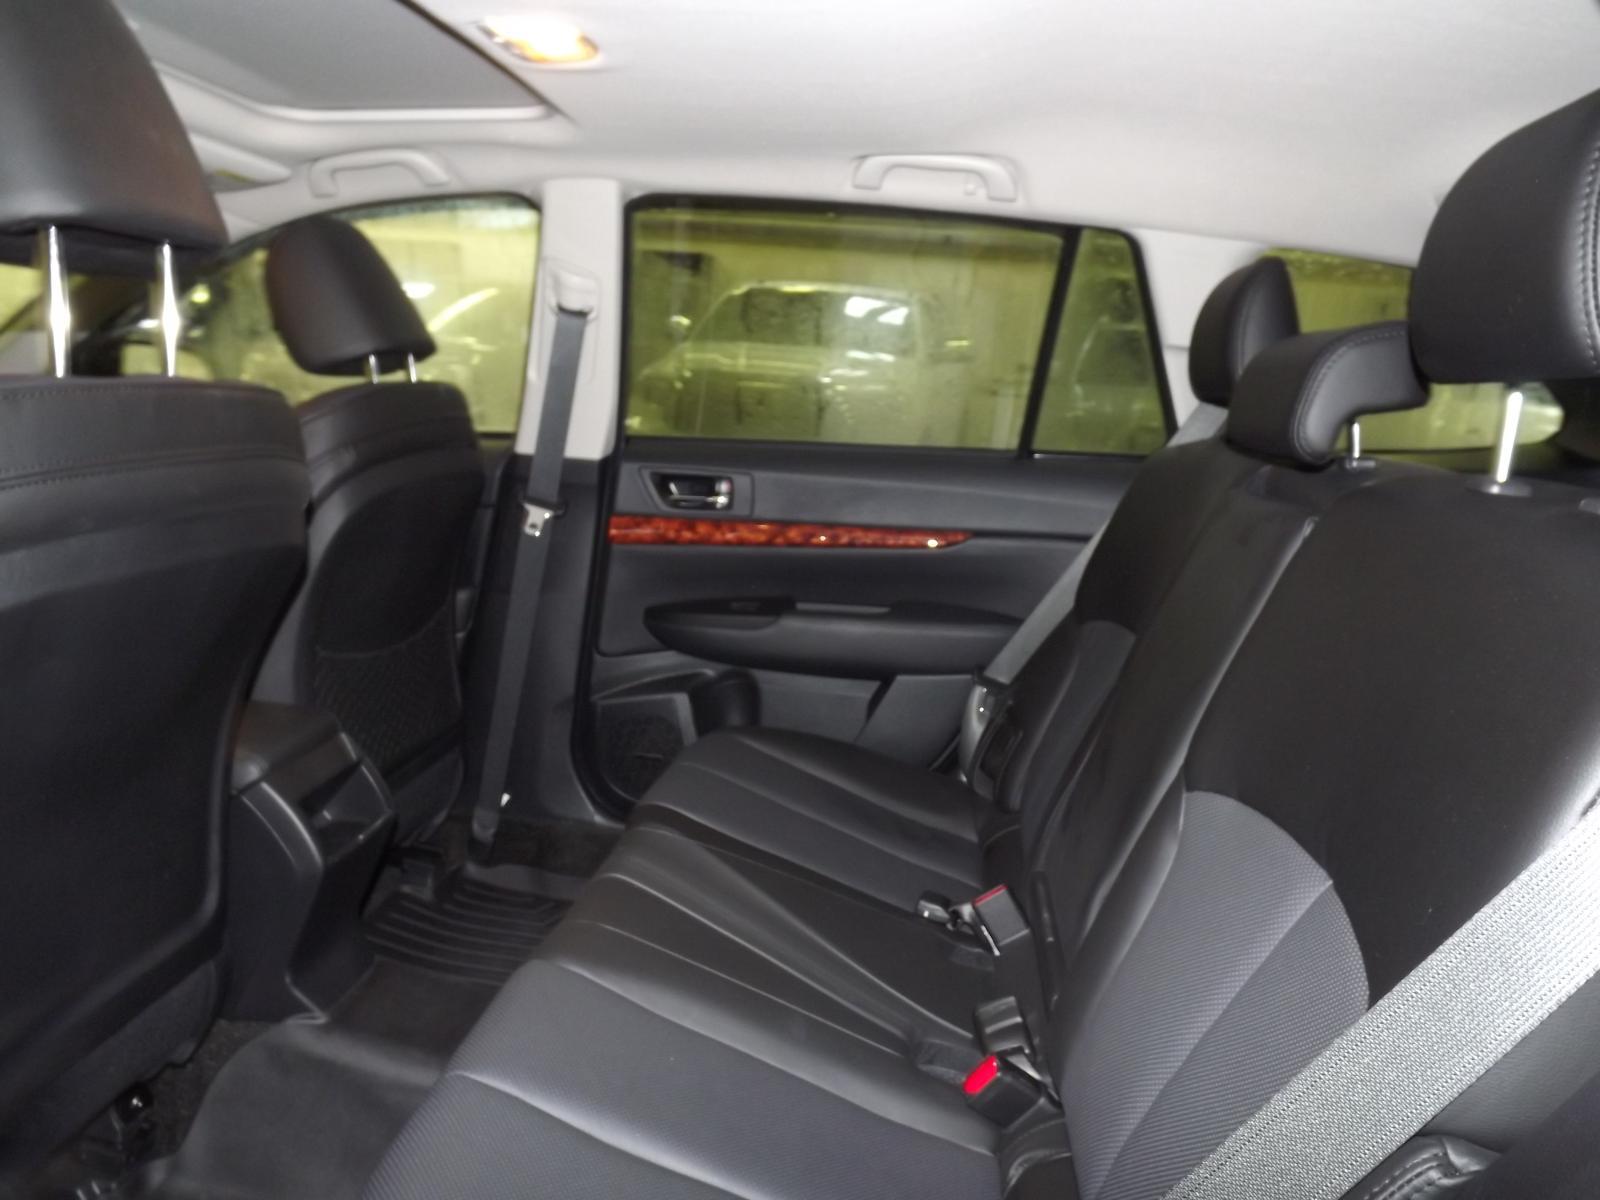 Used 2012 Subaru Outback in Edmonton,AB